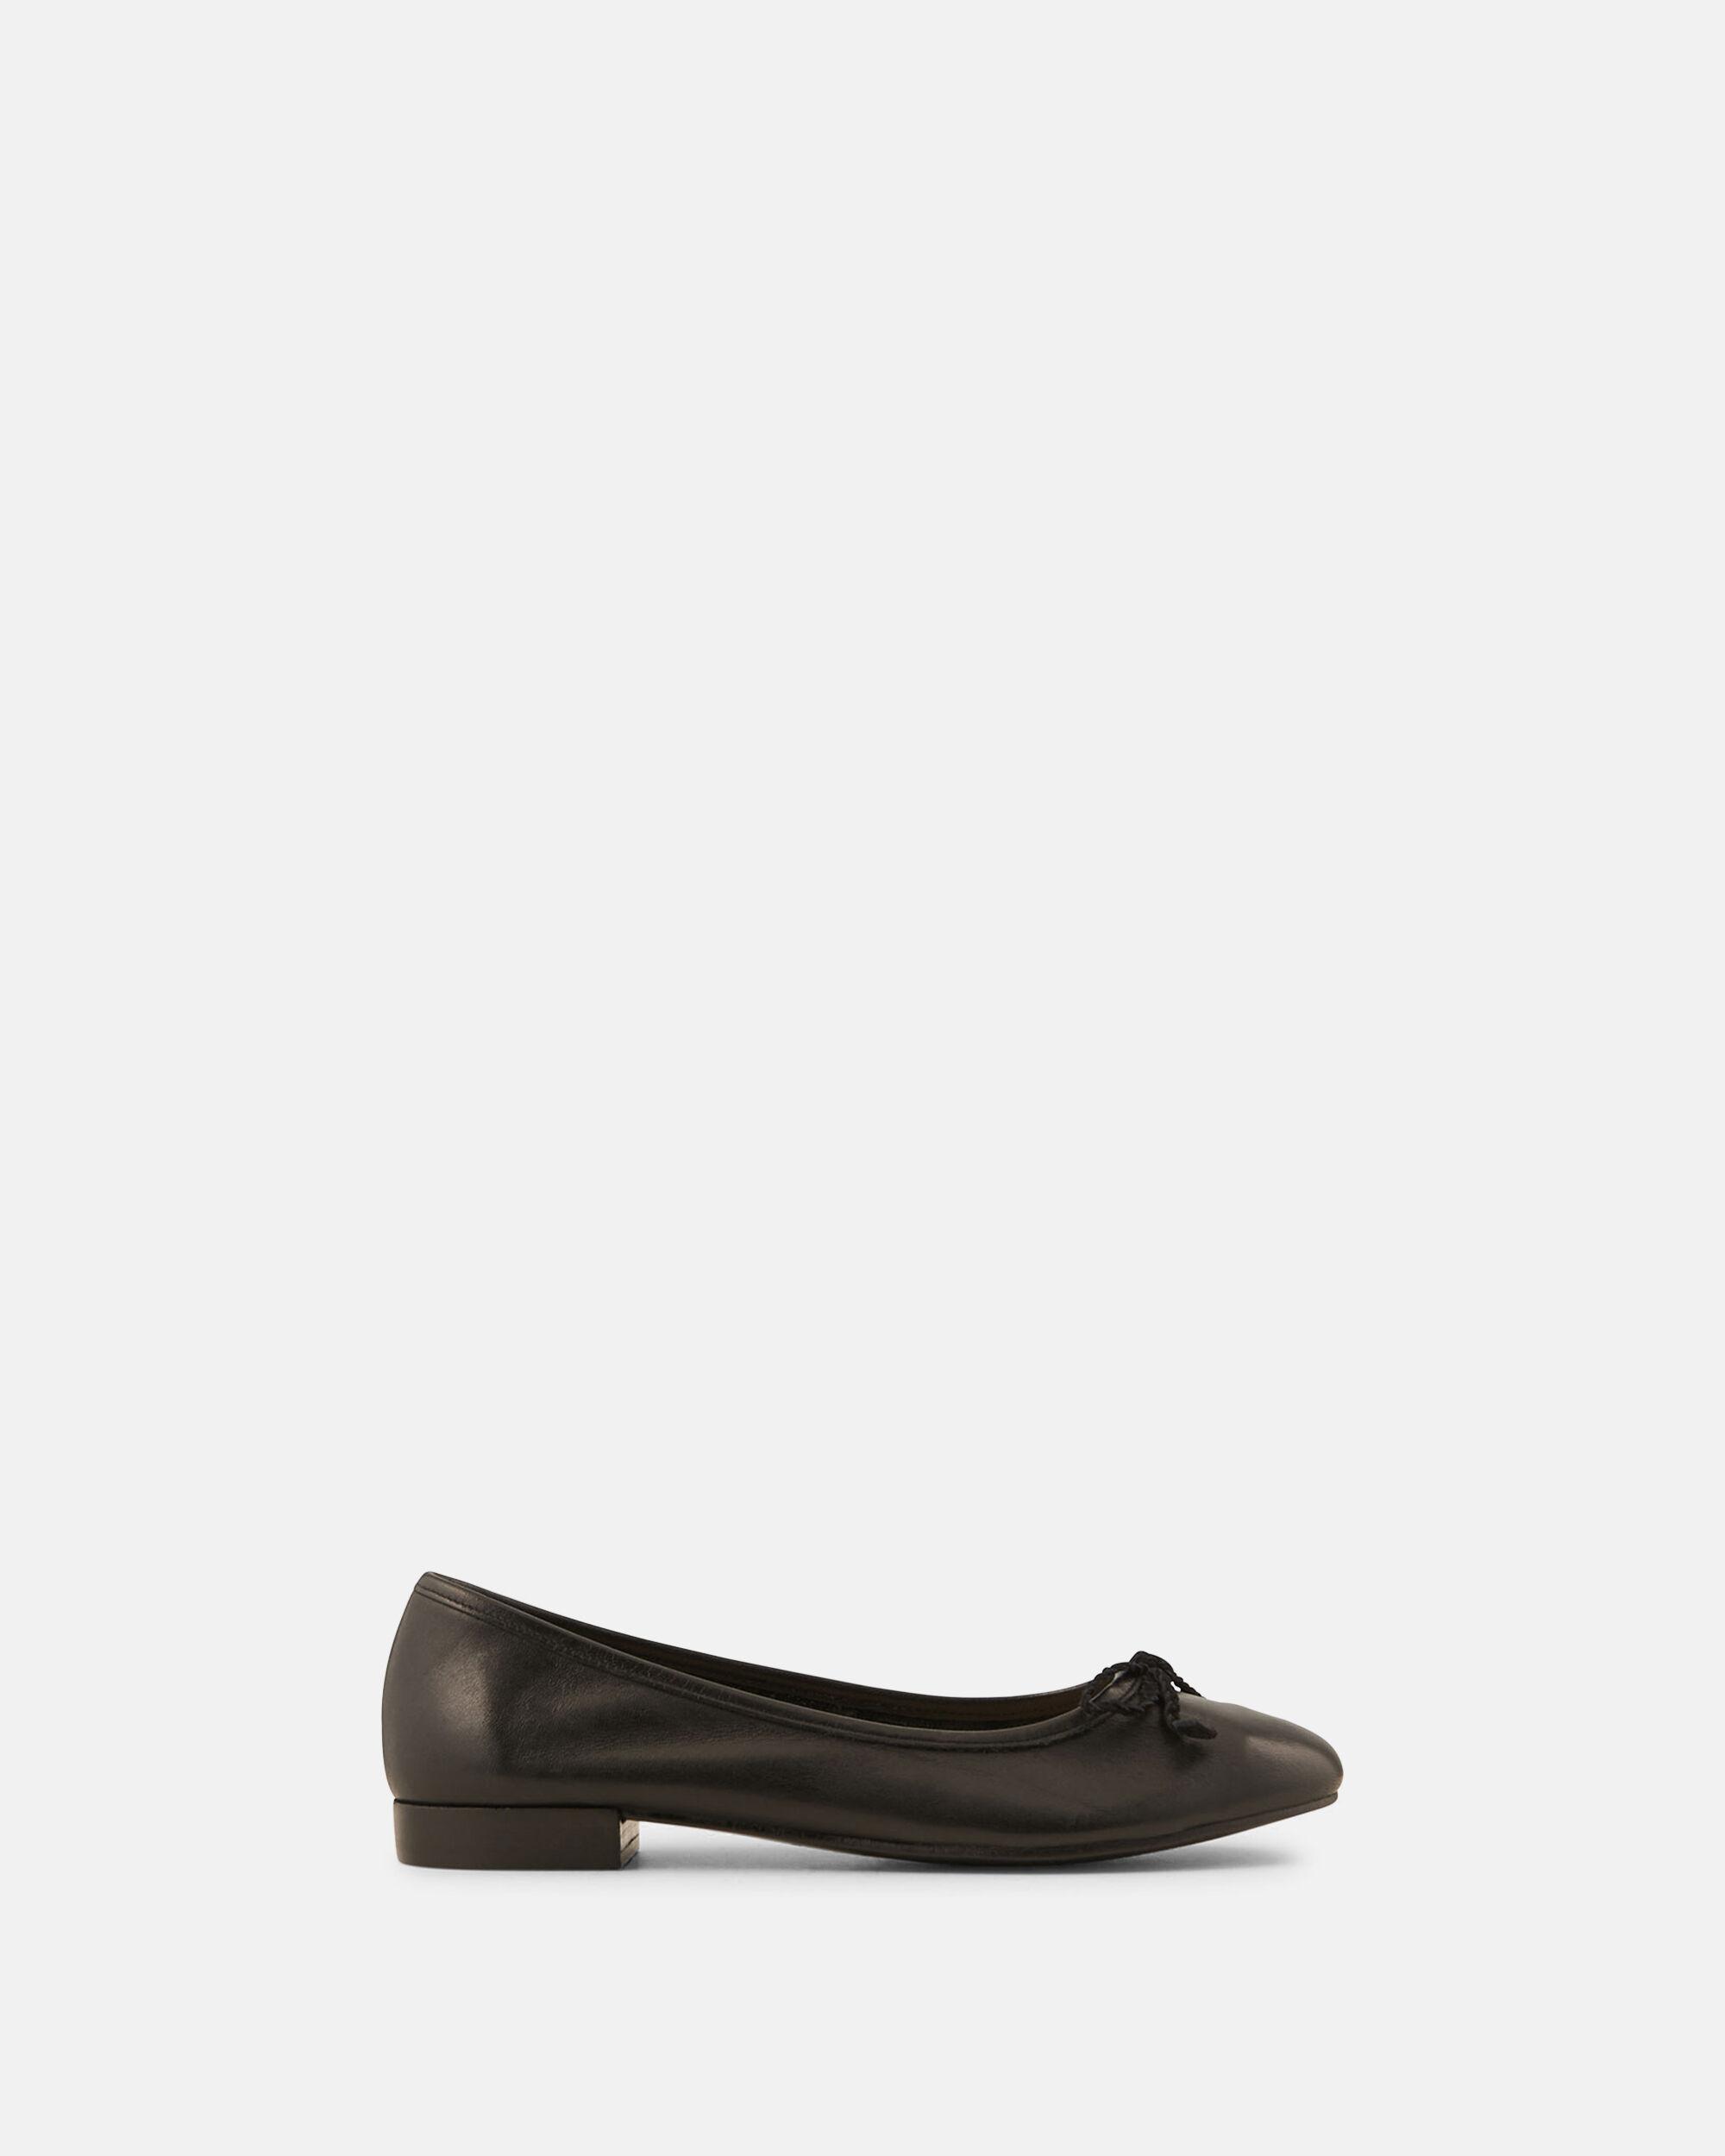 bc03f6ae6eb167 femme et Femme chaussures slippers Minelli Ballerine R6wPOZcq ...